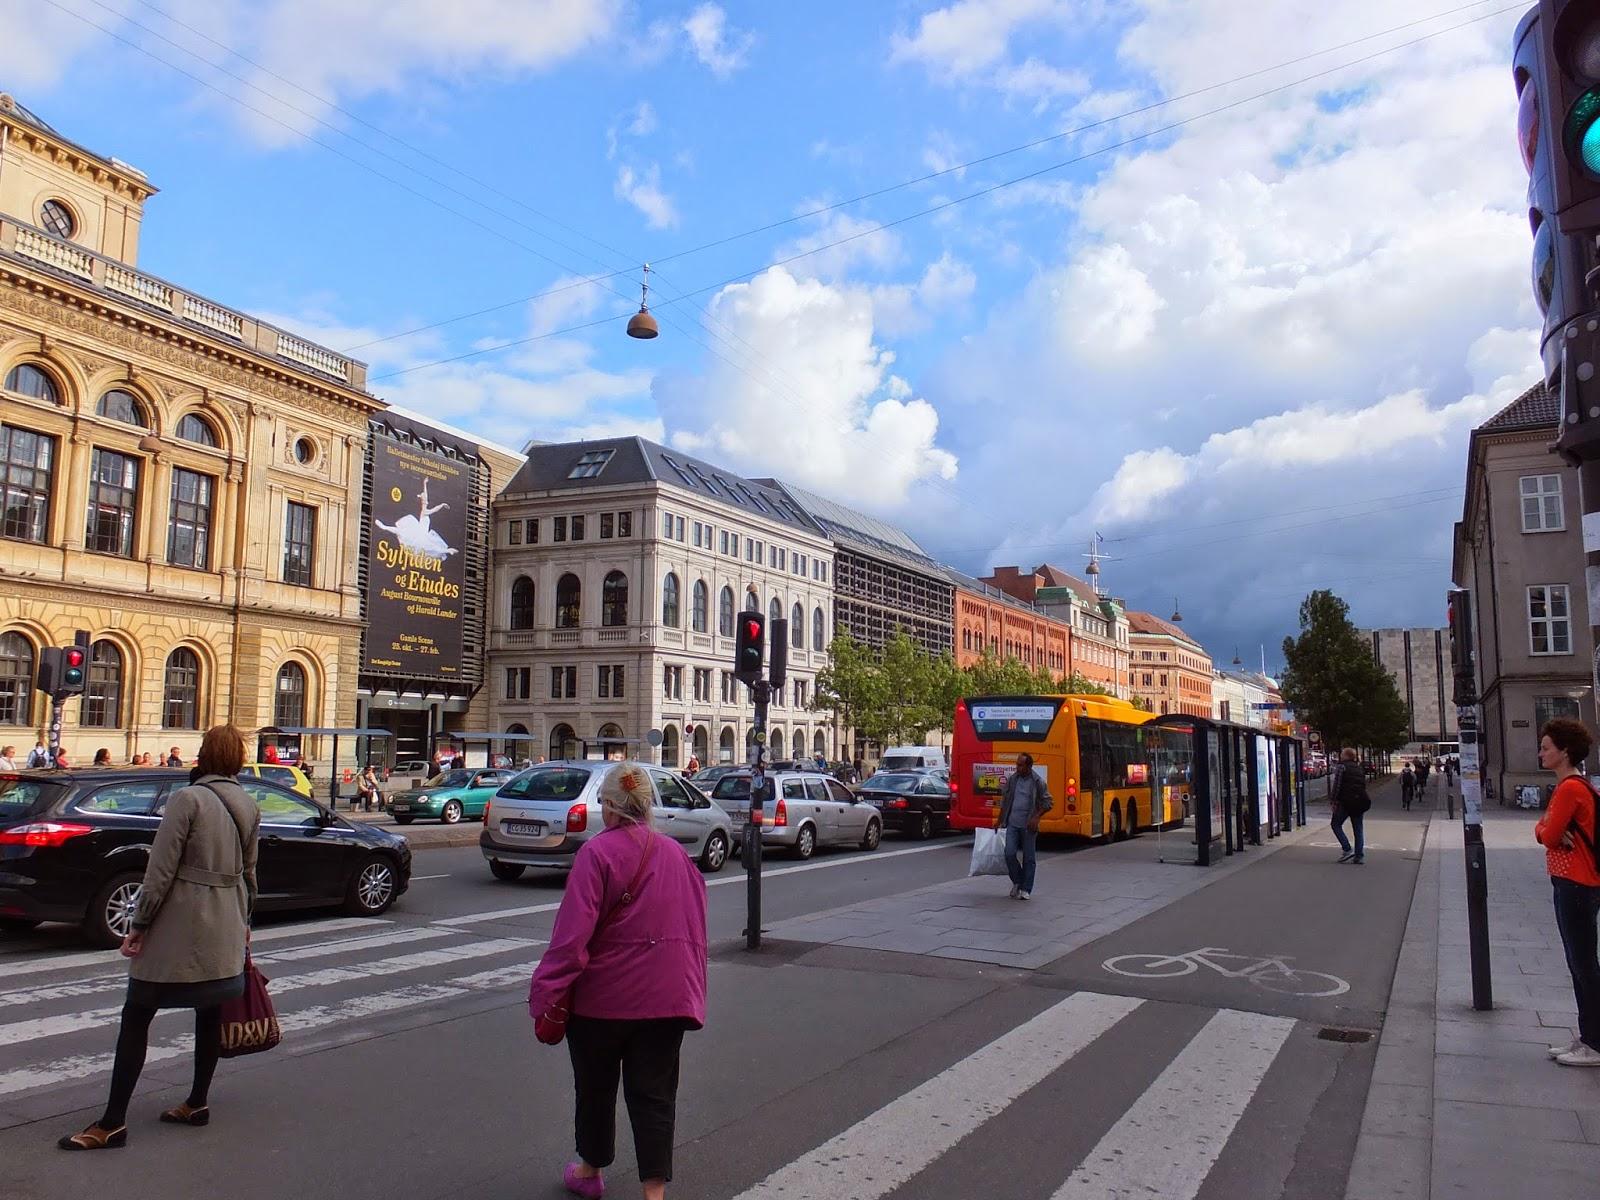 copenhagen-road コペンハーゲンの街中5